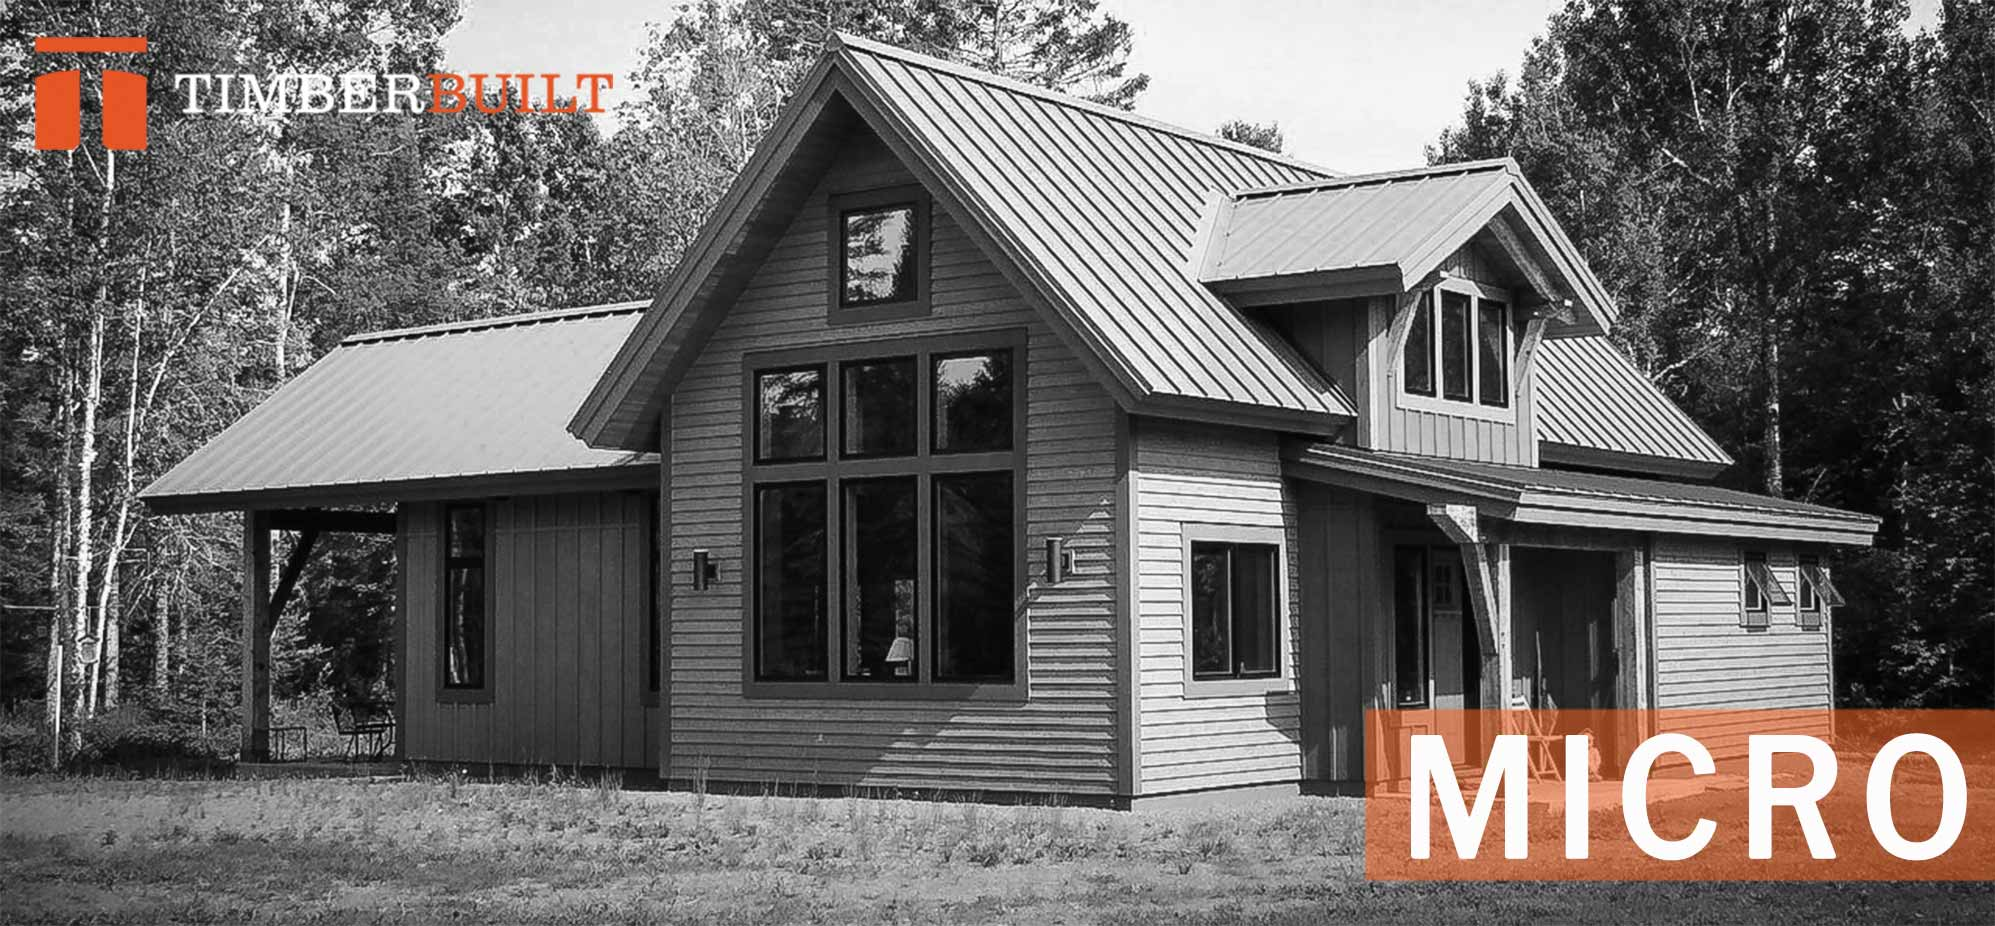 Micro | Timber Frame Home Designs | Timberbuilt